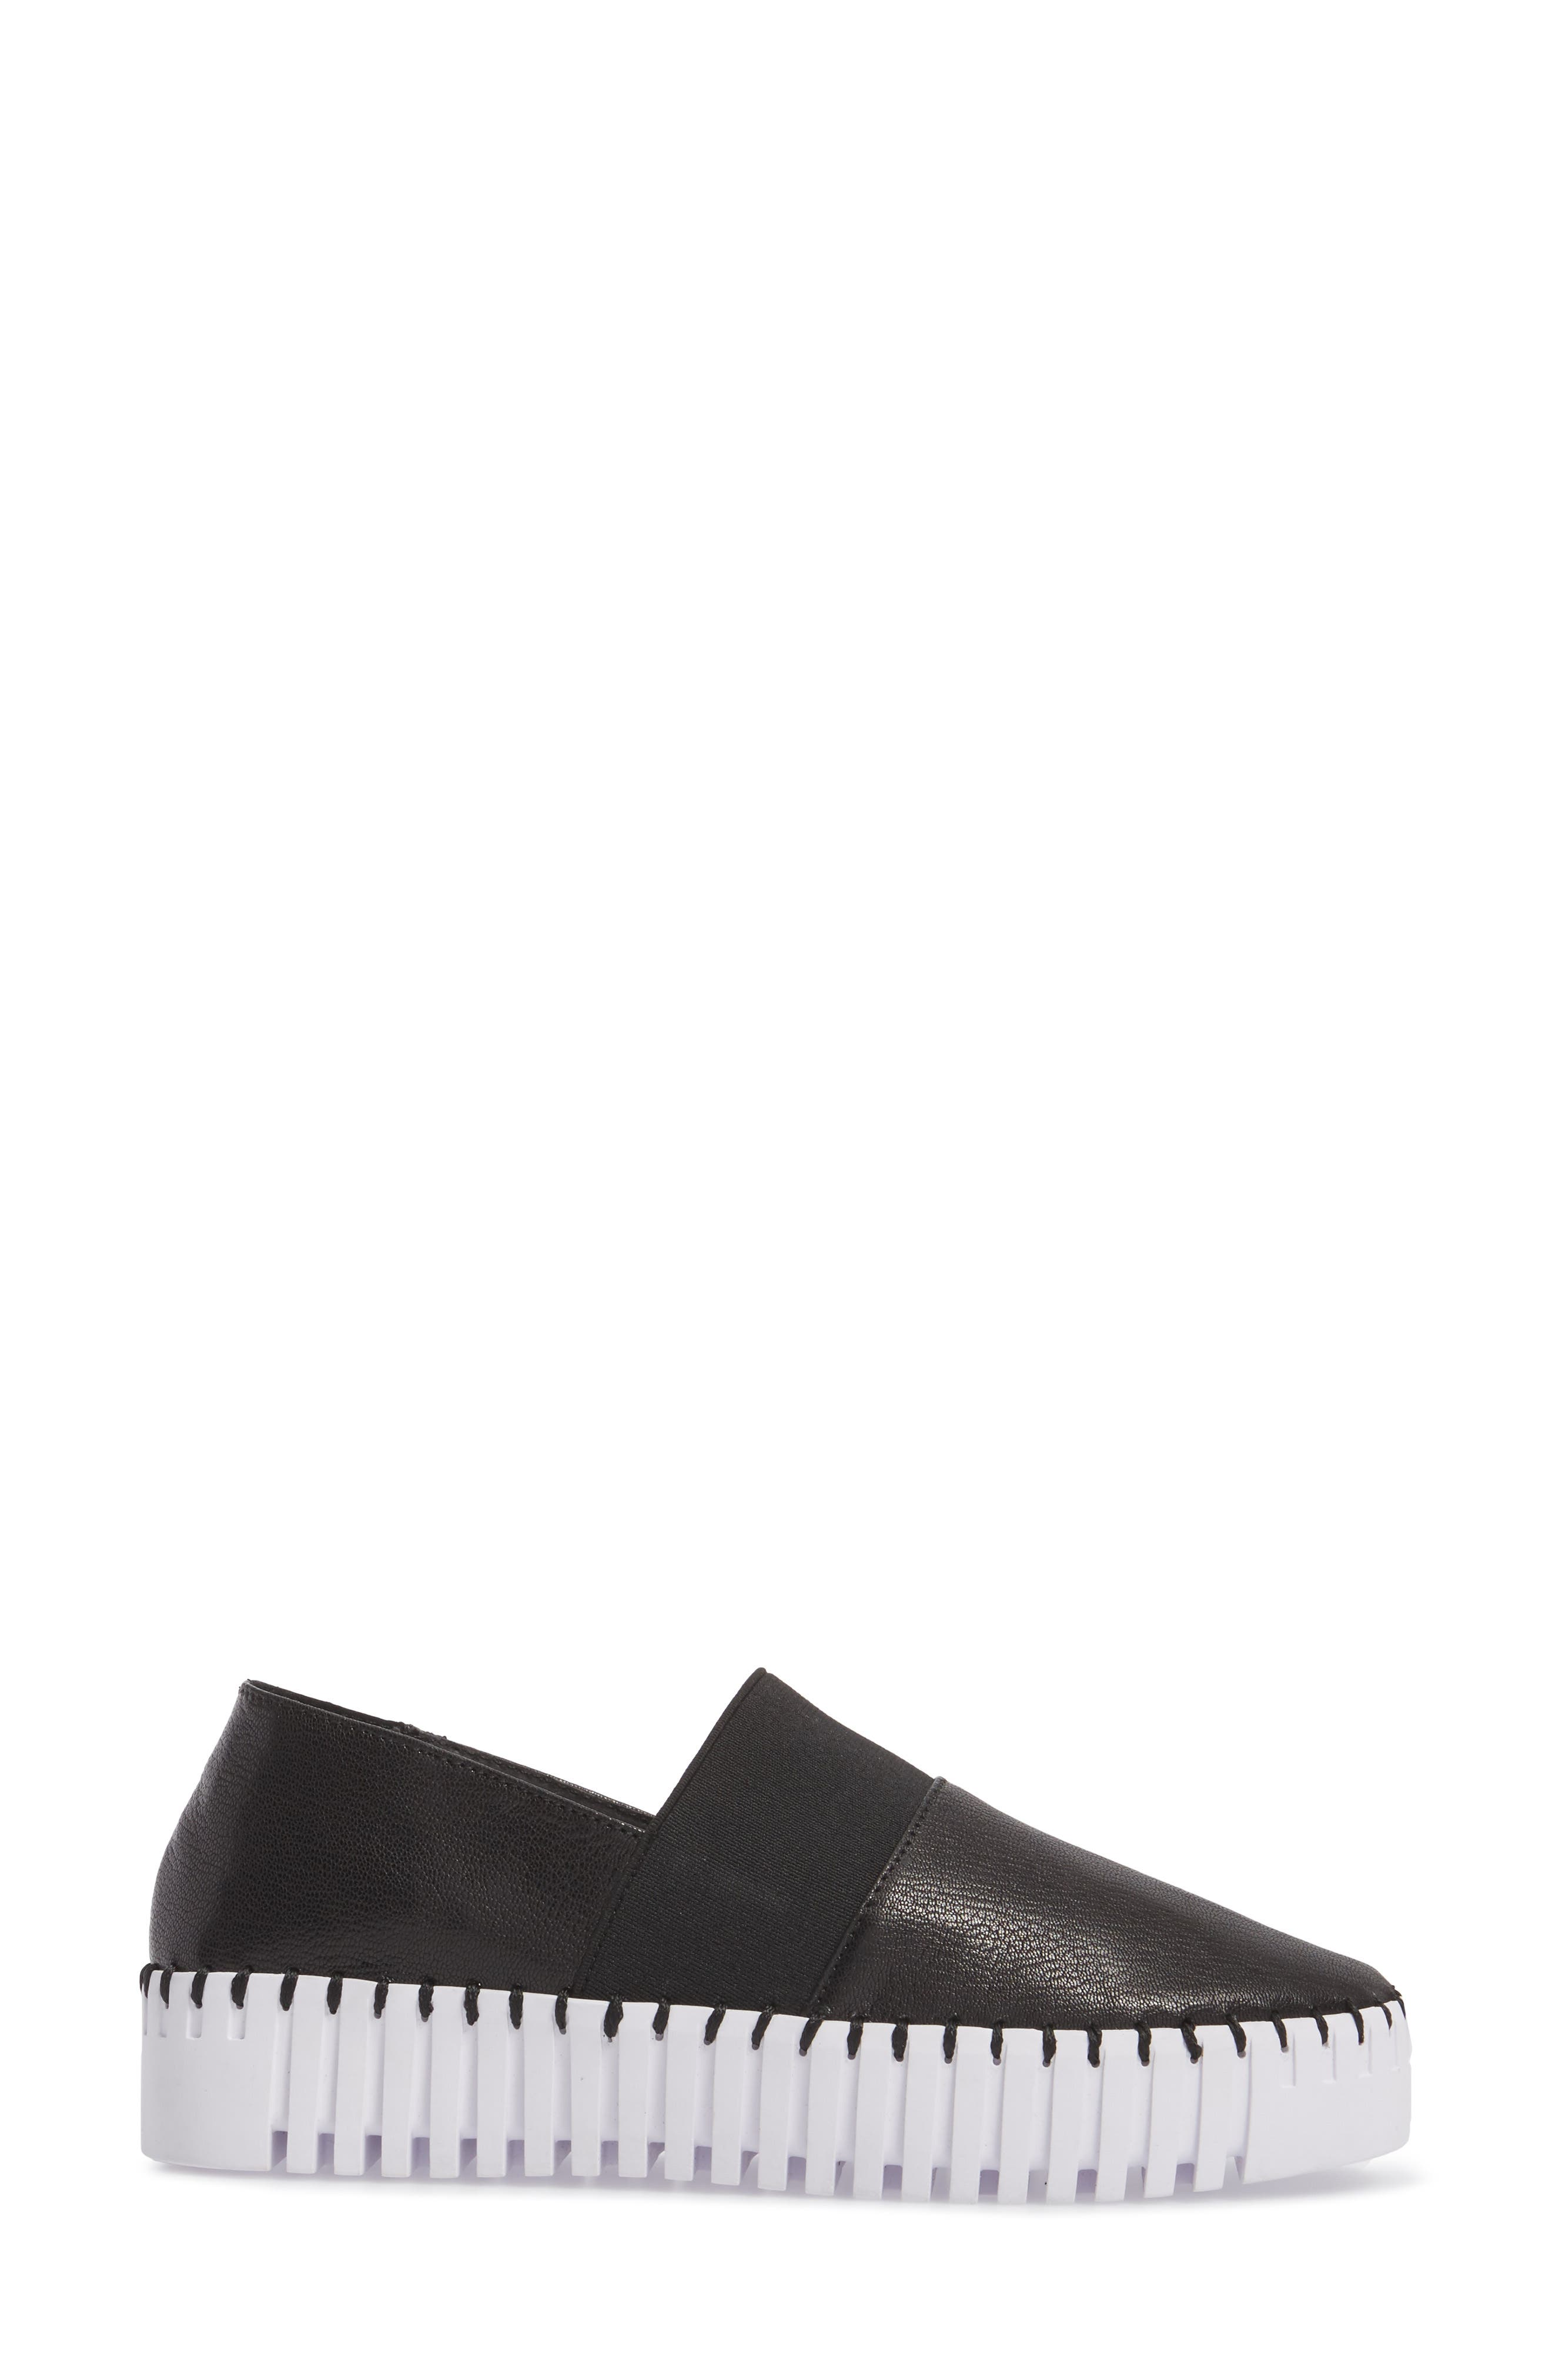 Alternate Image 3  - Jeffrey Campbell Cube Slip-On Platform Sneaker (Women)